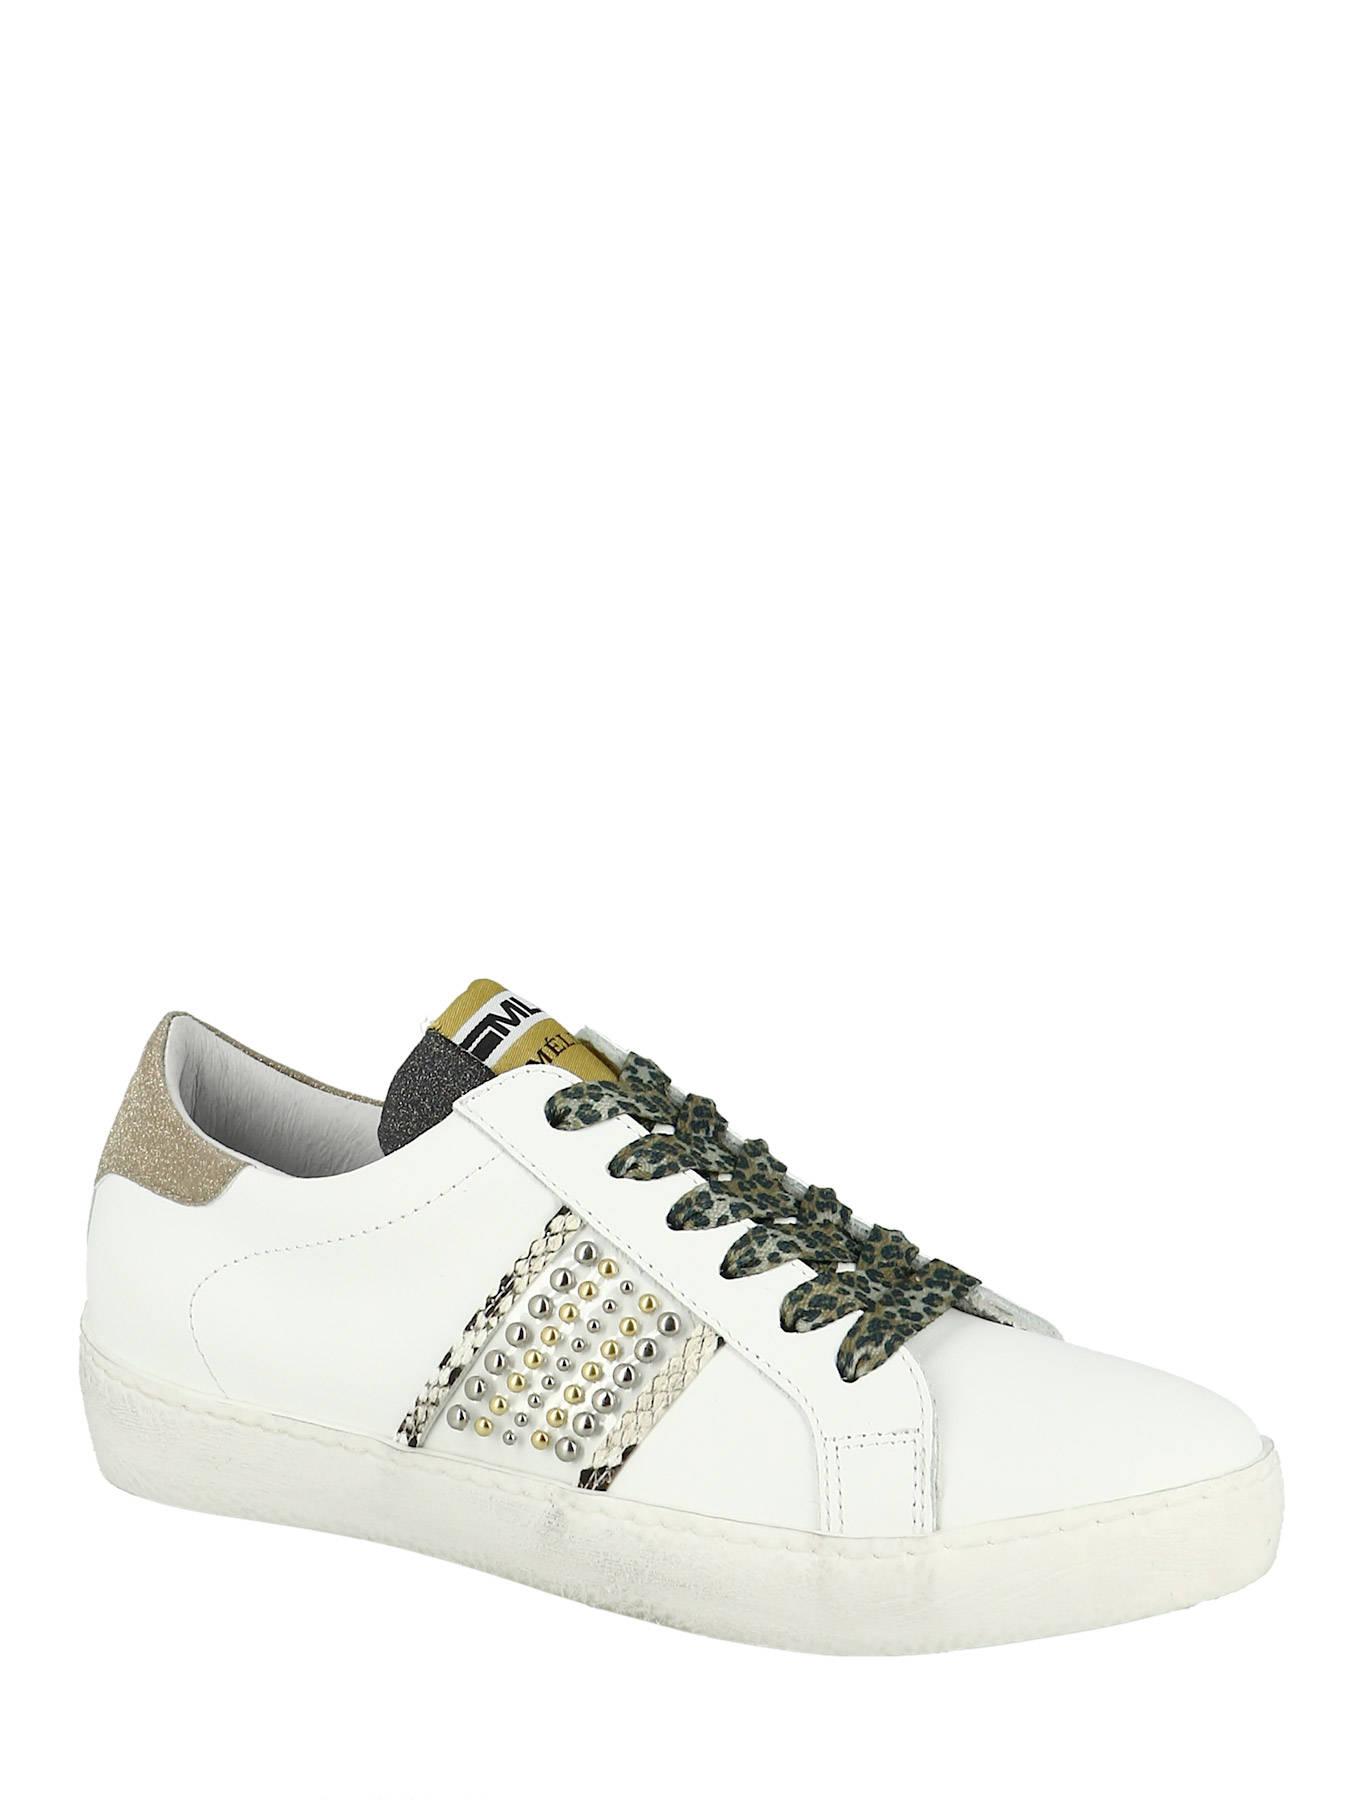 Meline Sneakers KUC.1348 - best prices